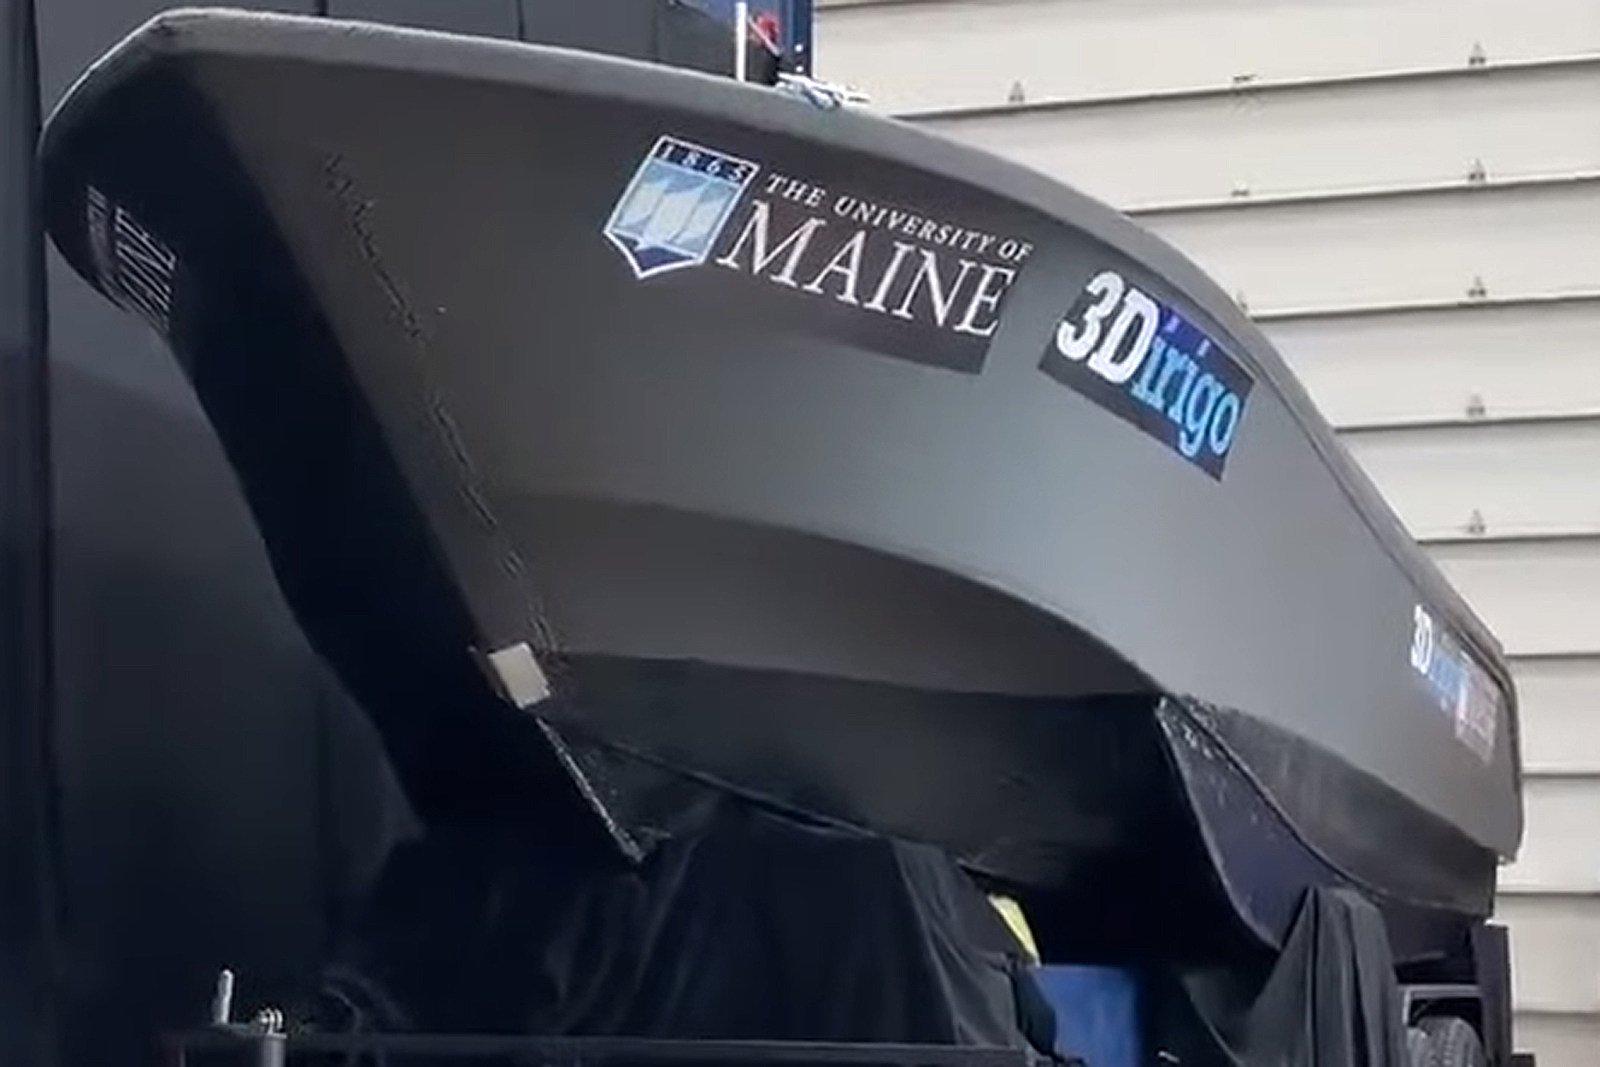 Así se imprime un barco de 2 toneladas en 3D